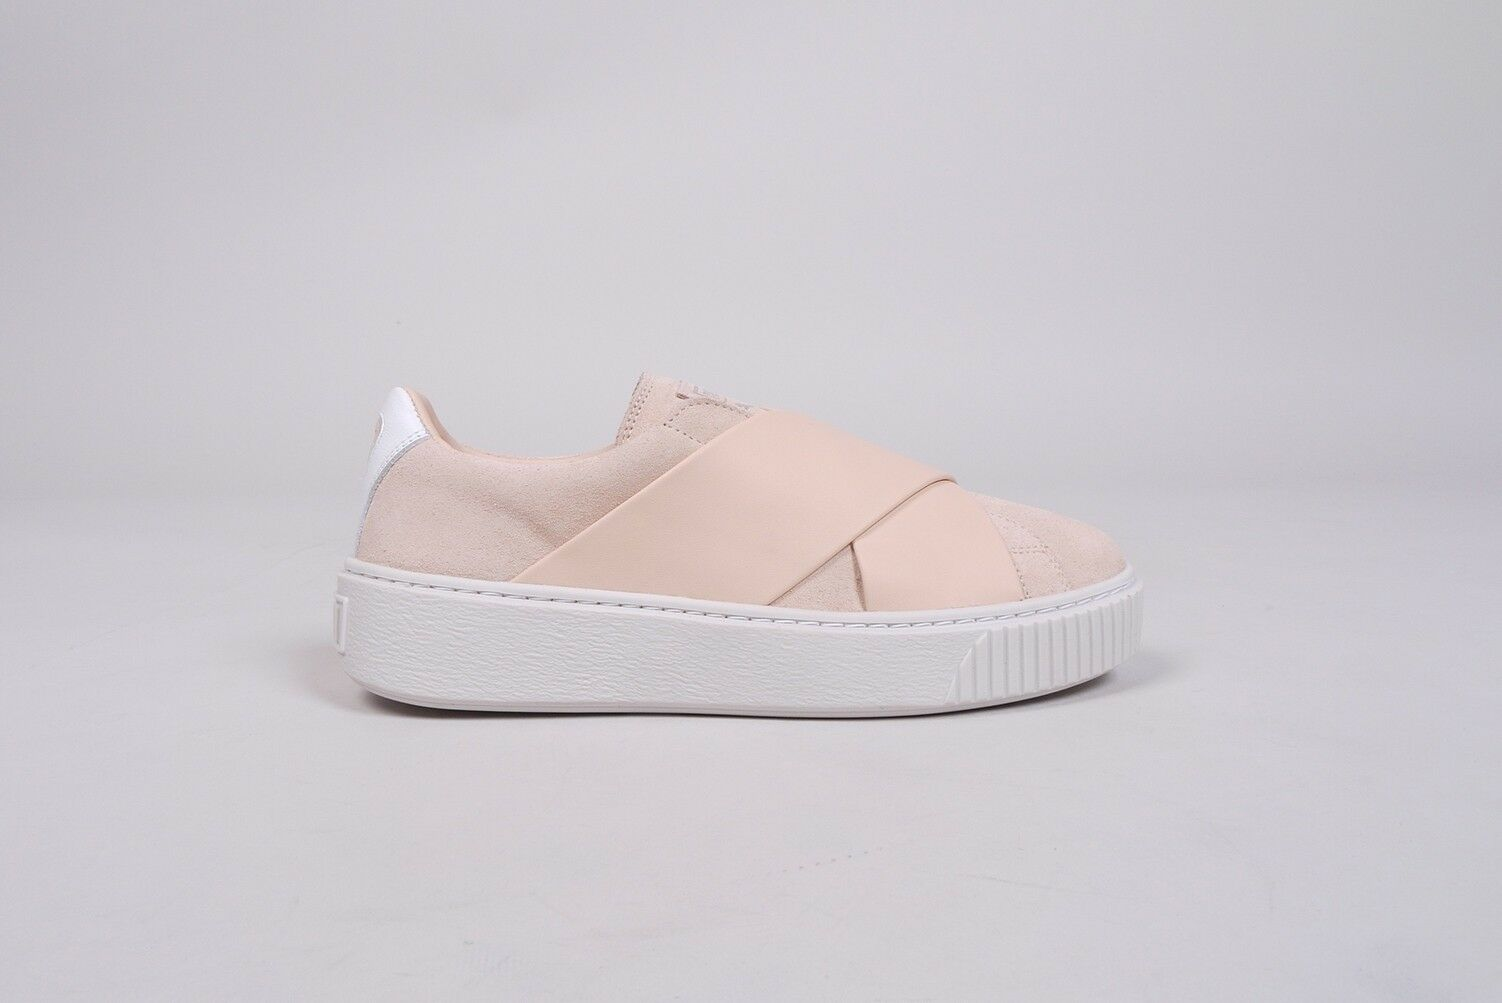 Puma Platform x Strap cortos señora zapatos us 9 Cream tan Rihanna